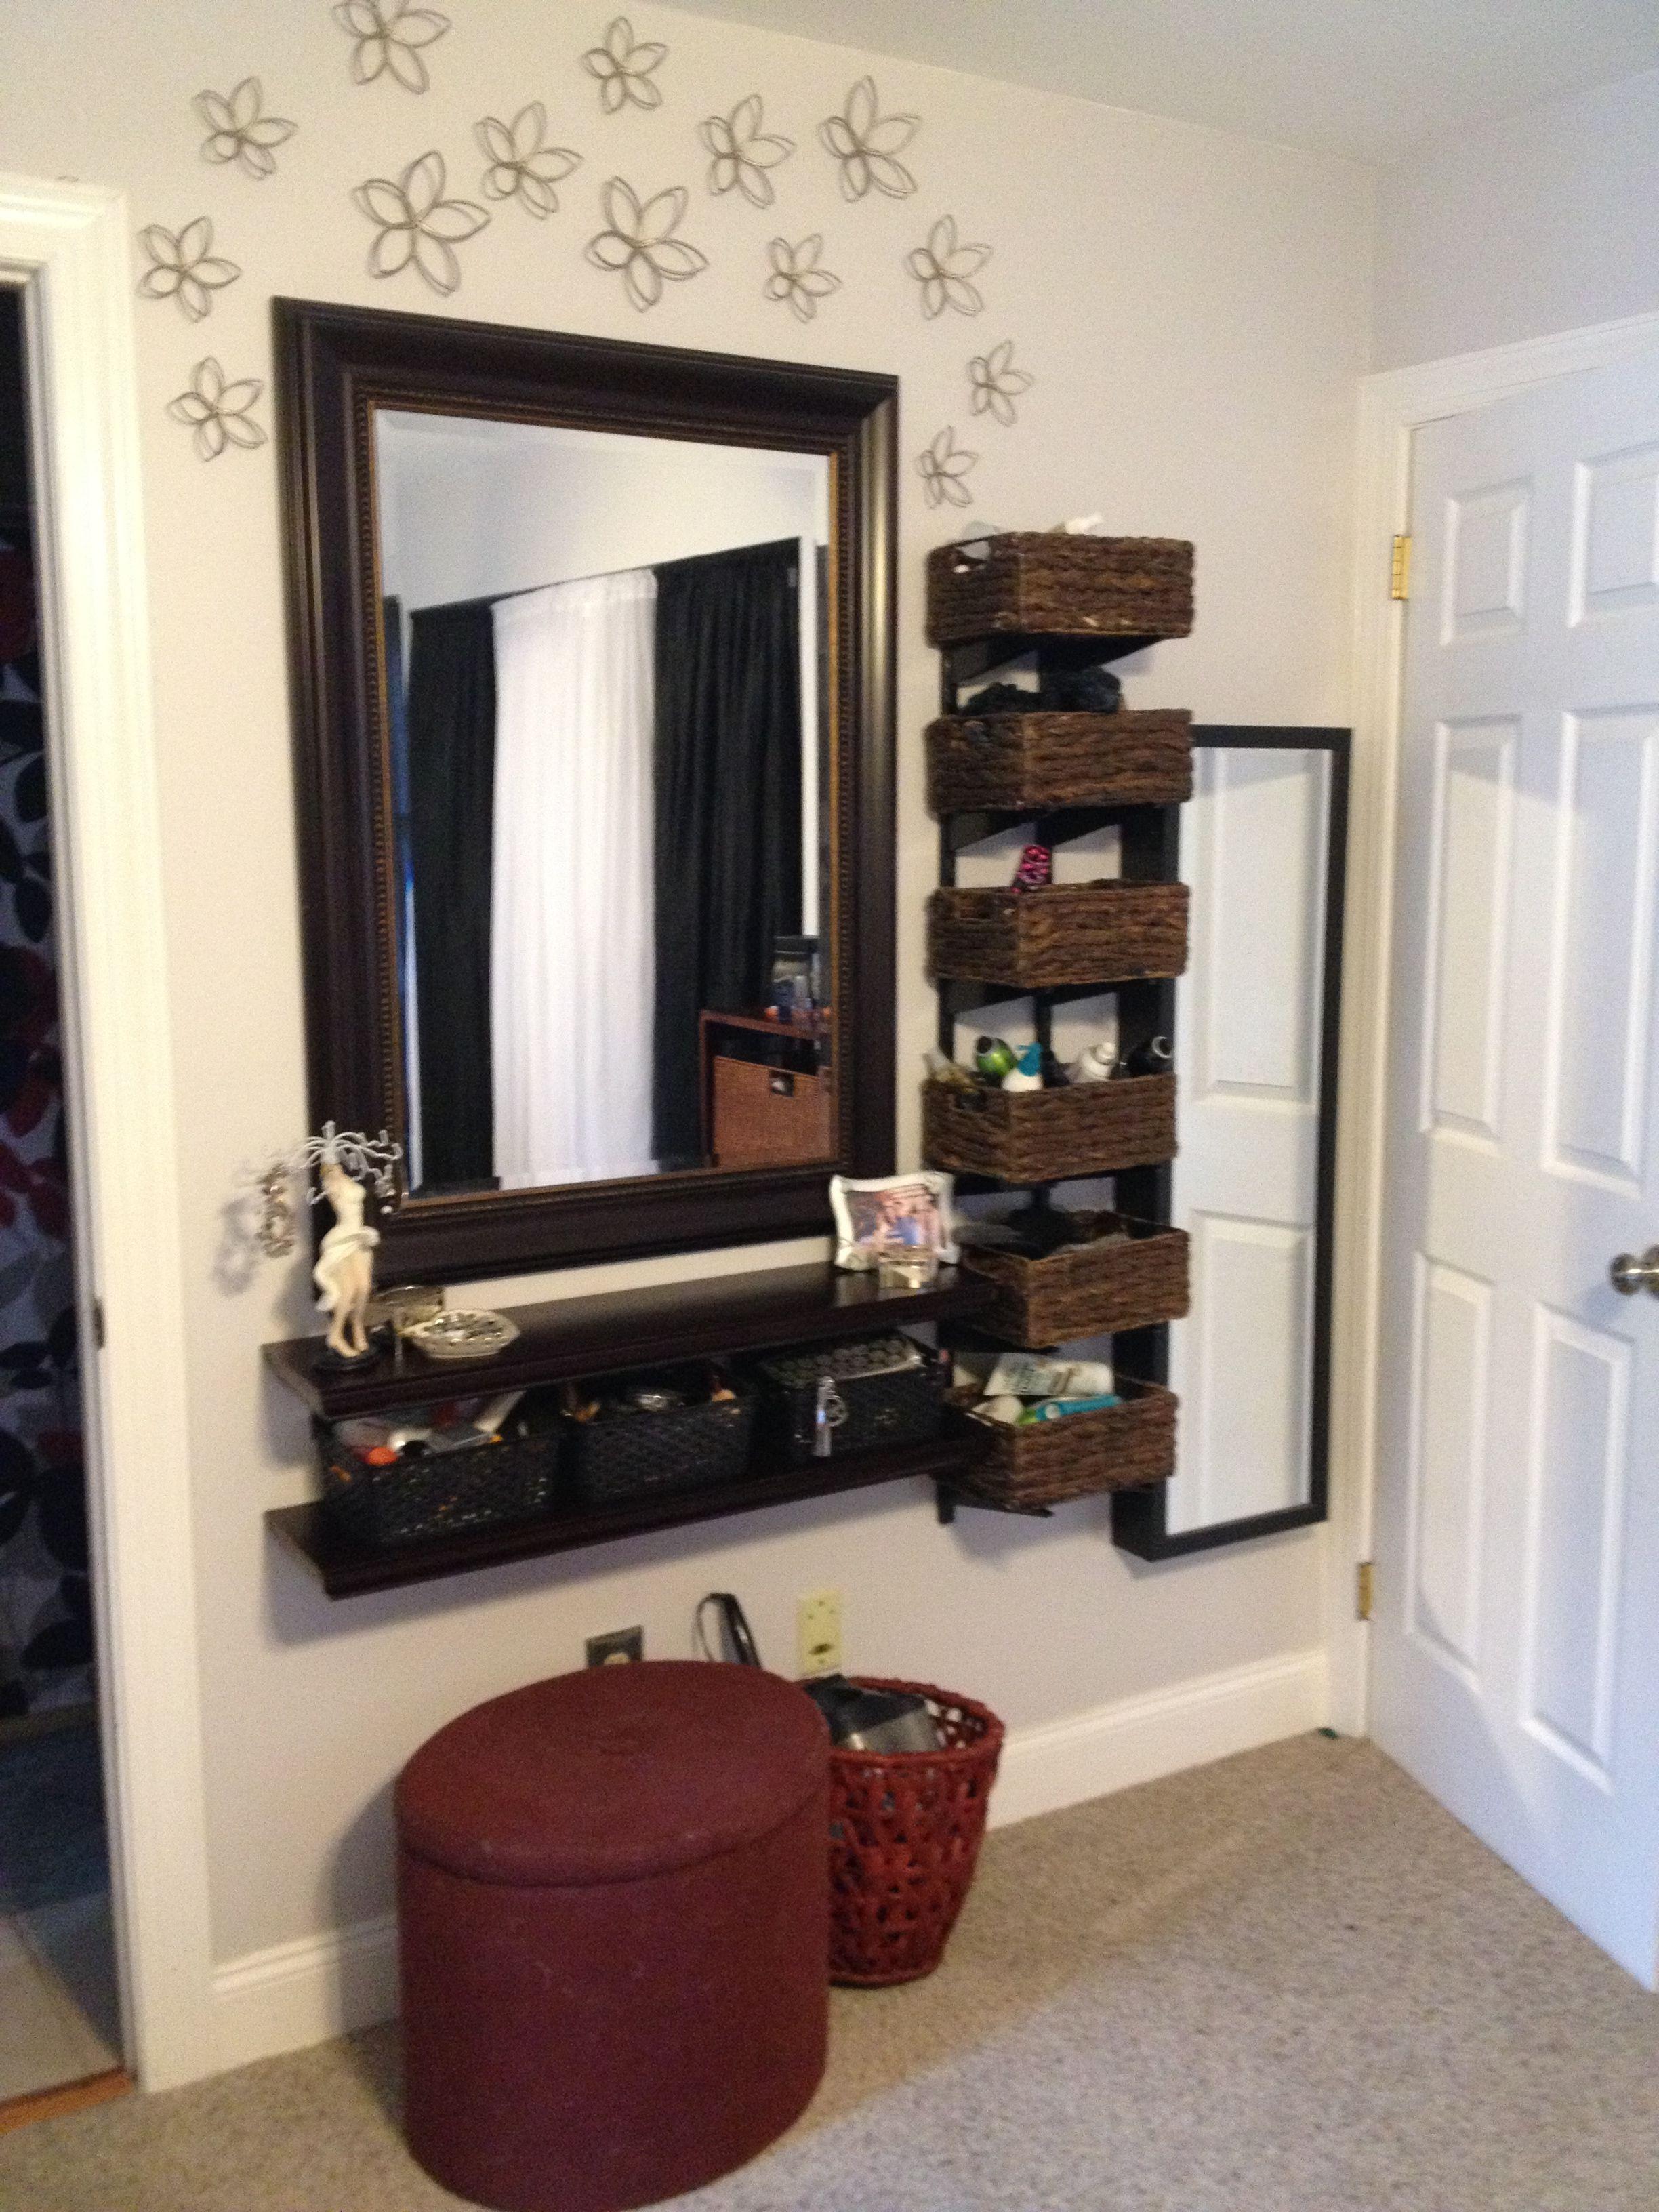 Diy Space Saving Vanity Area Good Idea Baskets On Shelves